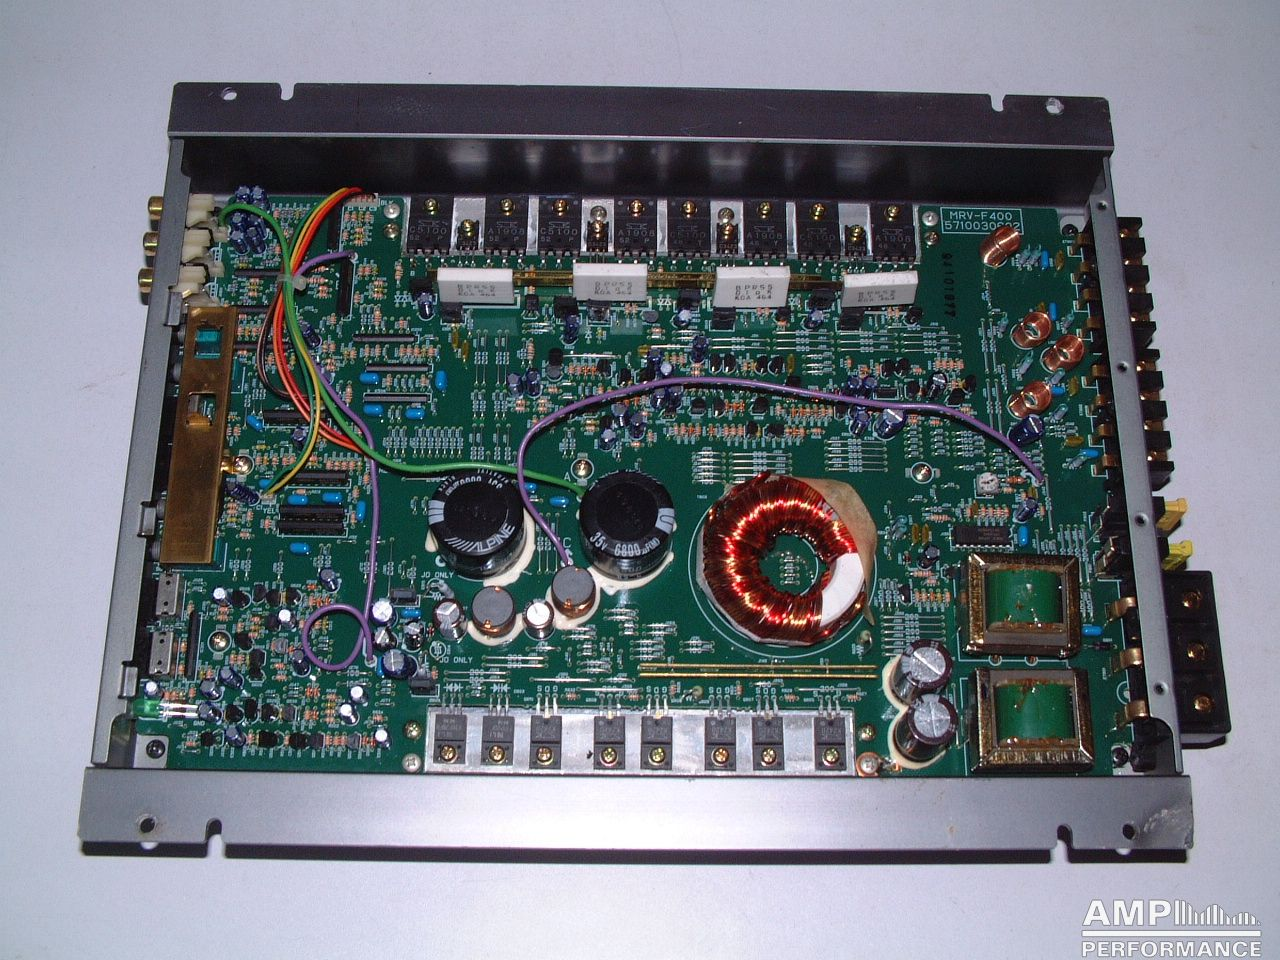 Alpine Mrv F400 Amp Performance Bridged Wiring Diagram